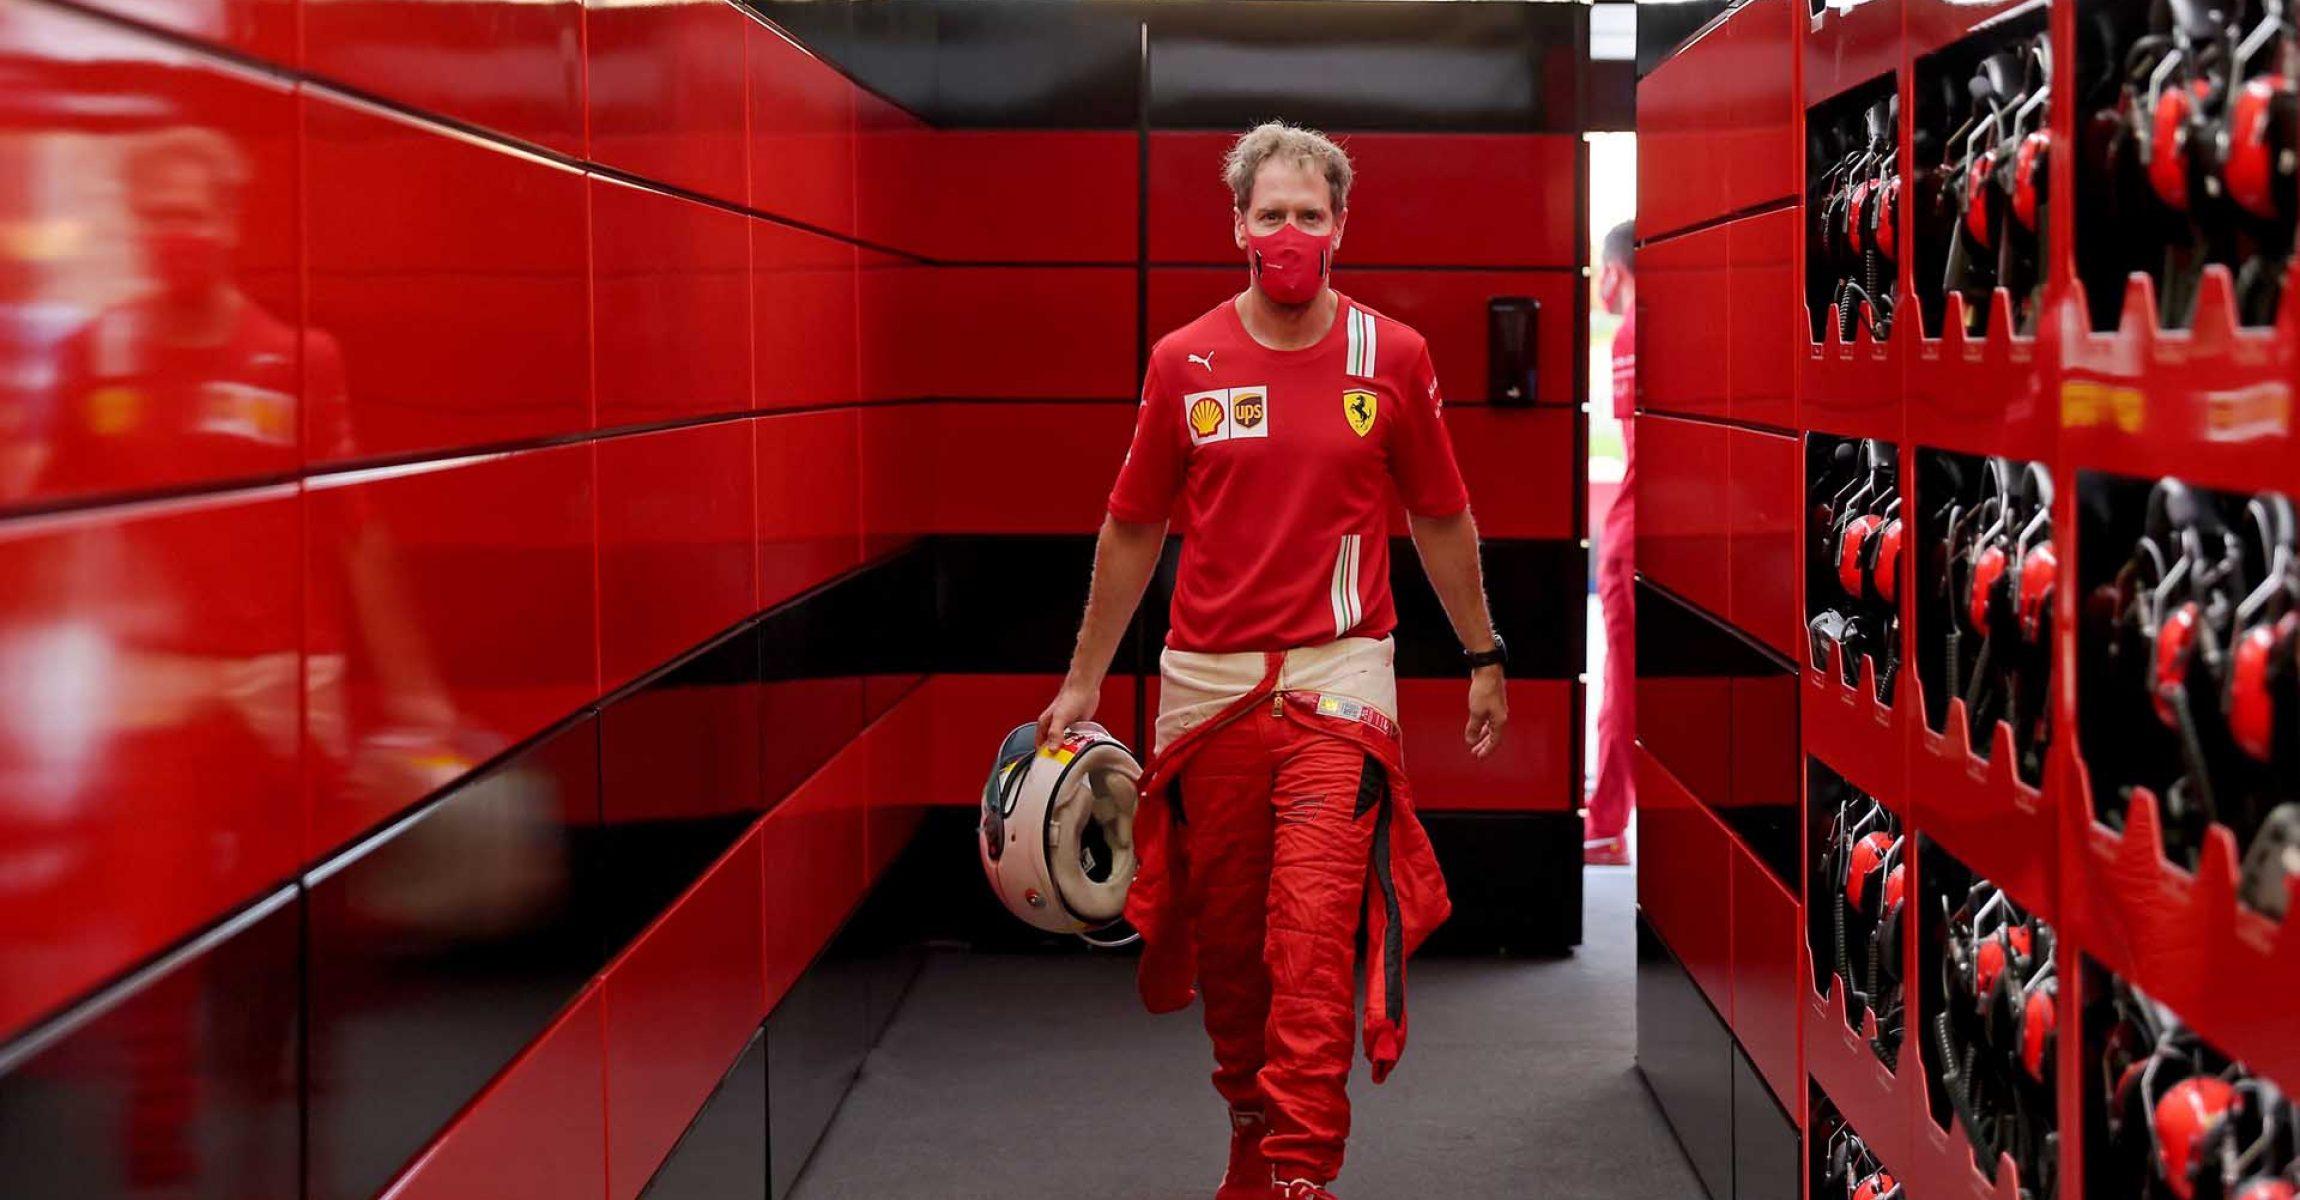 GP SAKHIR  F1/2020 - GIOVEDÌ 03/12/2020      credit: @Scuderia Ferrari Press Office Sebastian Vettel